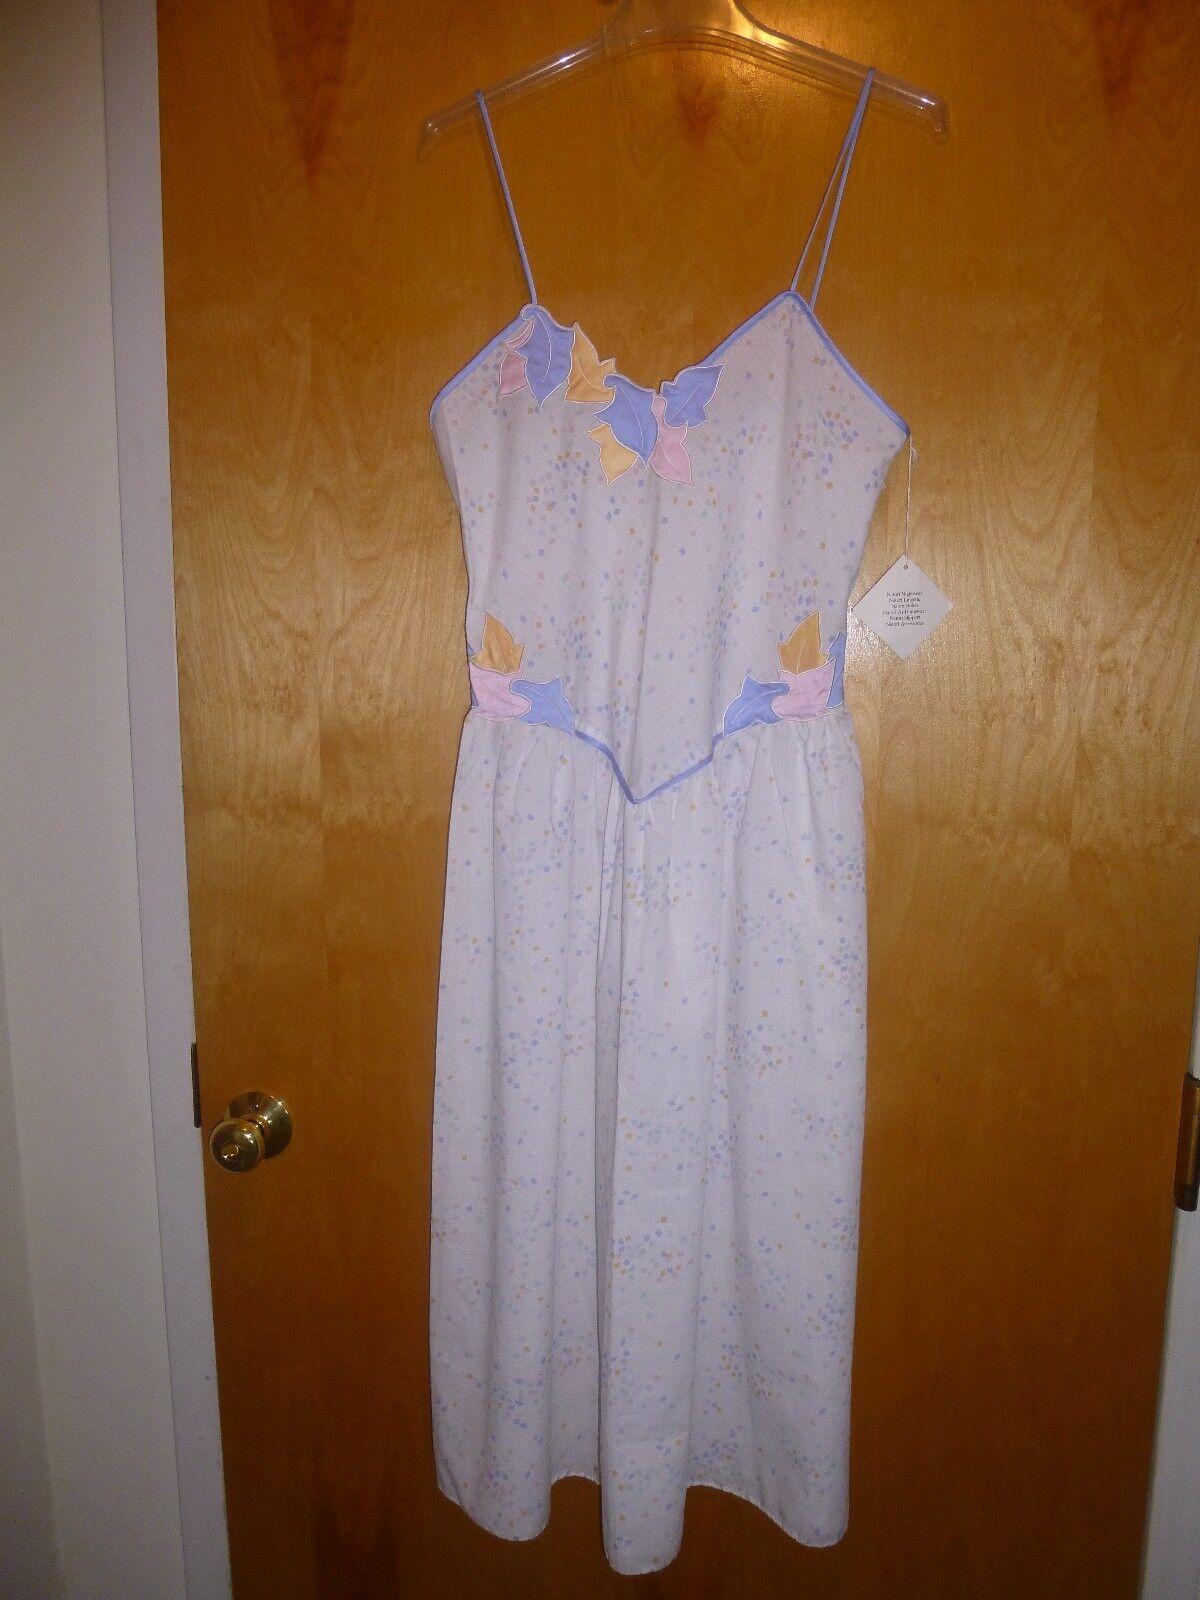 NWT Natori APPLIQUED Cotton JORDAN MARSH Spaghetti Strap Long Night Gown M